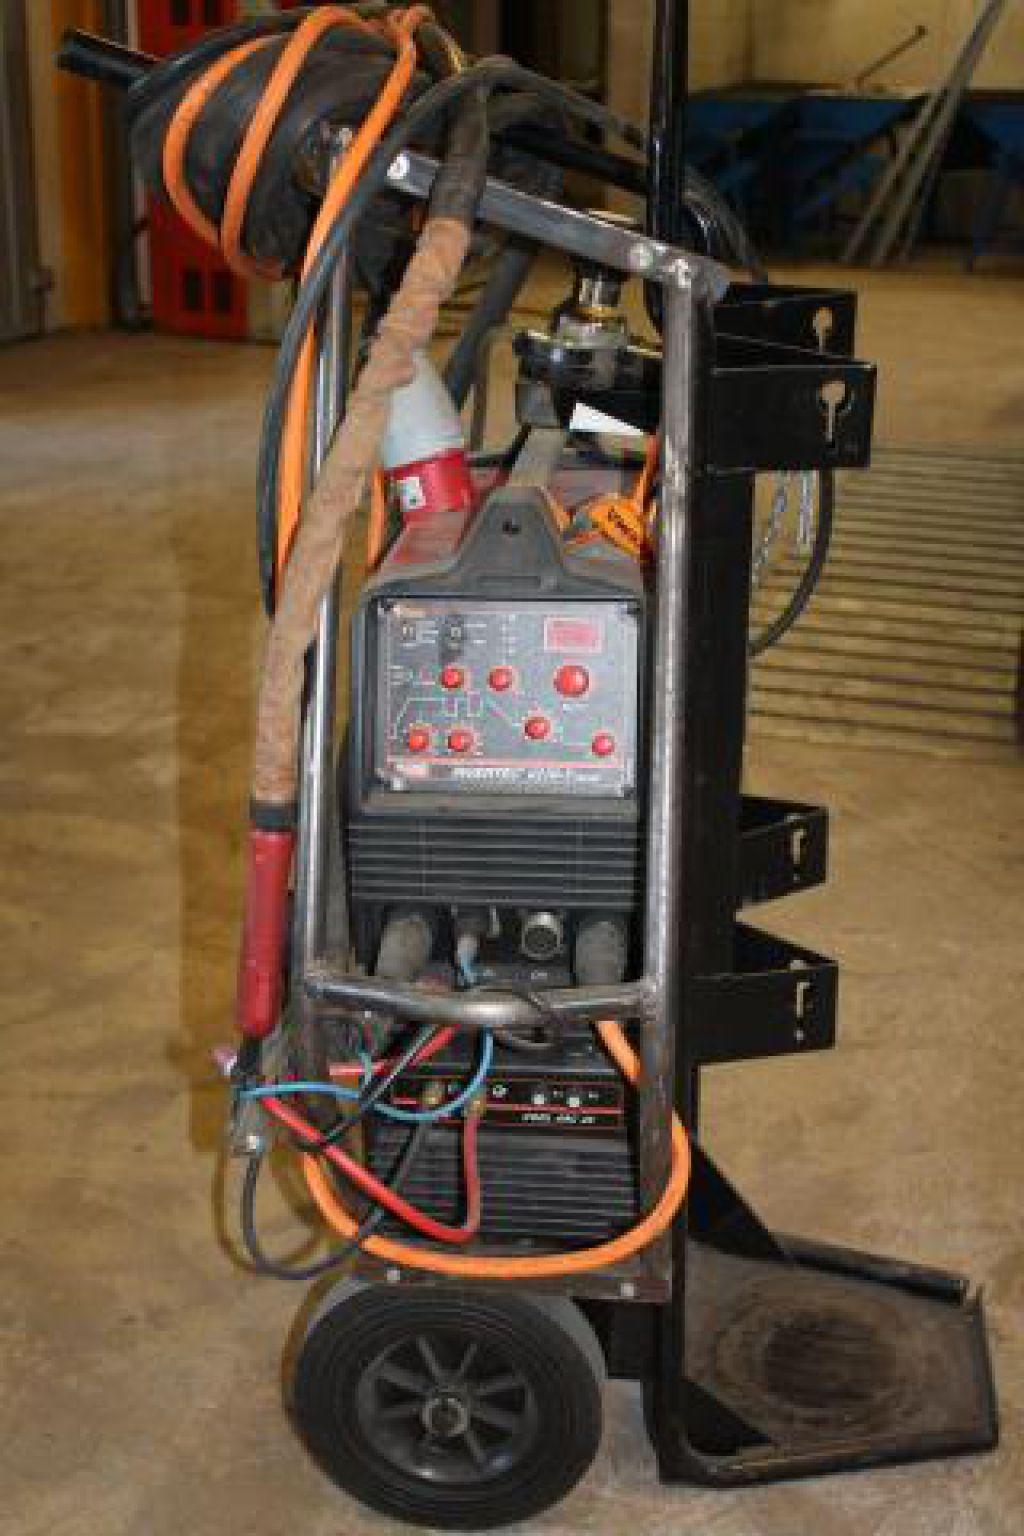 Splitter nya TIG - svets LINCOLN Invertec V270 for sale. Retrade offers used IO-34